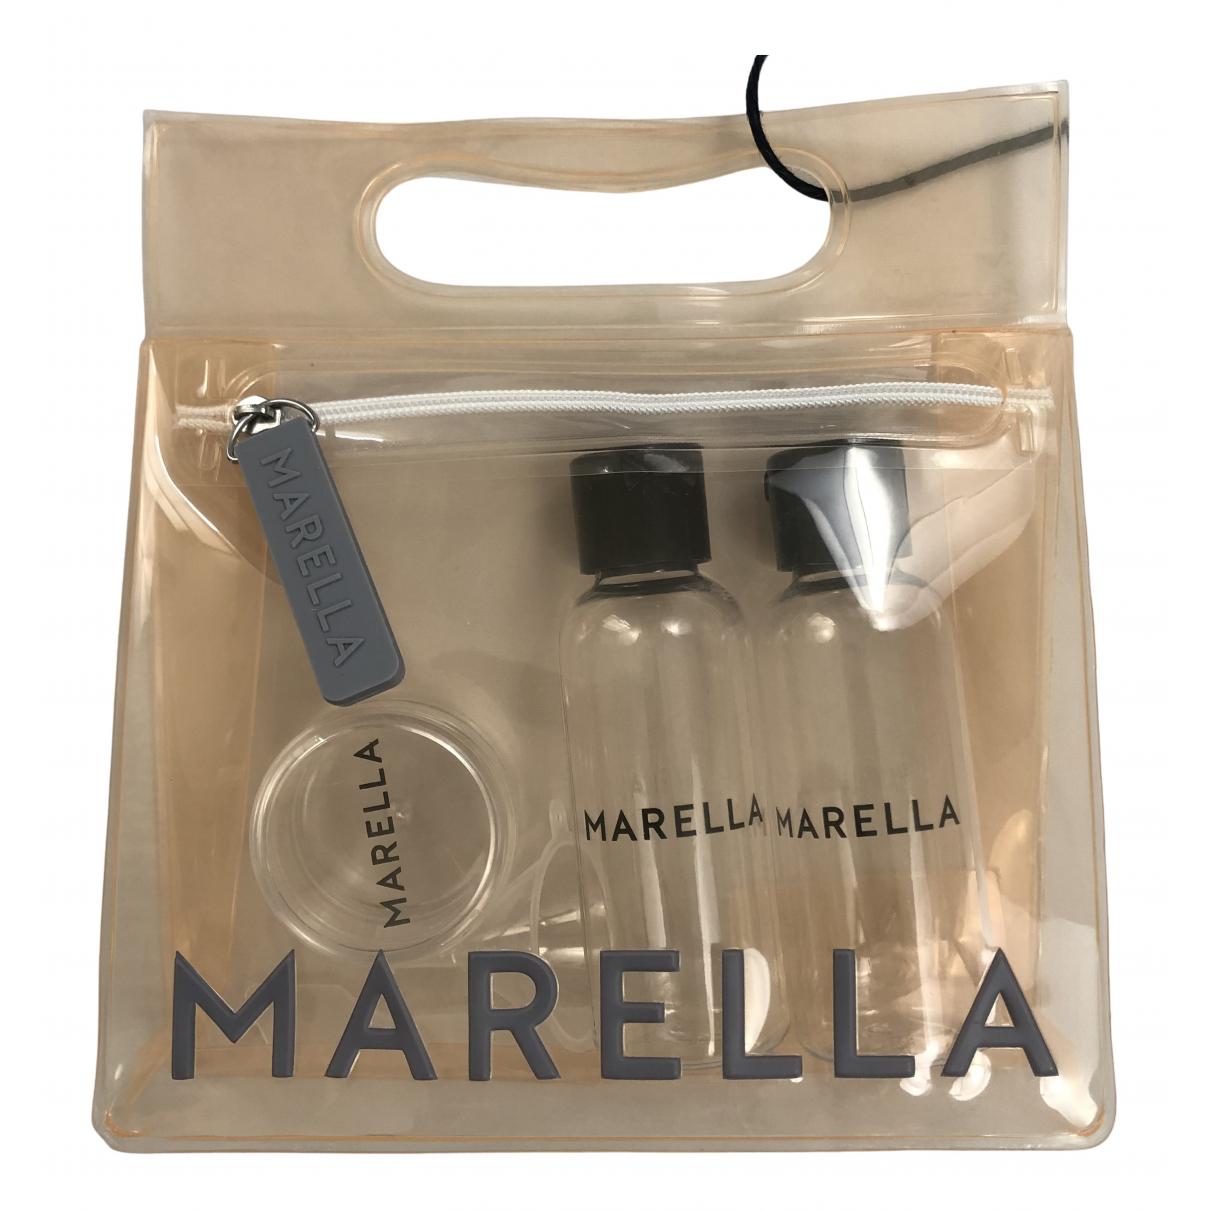 Objeto de decoracion Marella